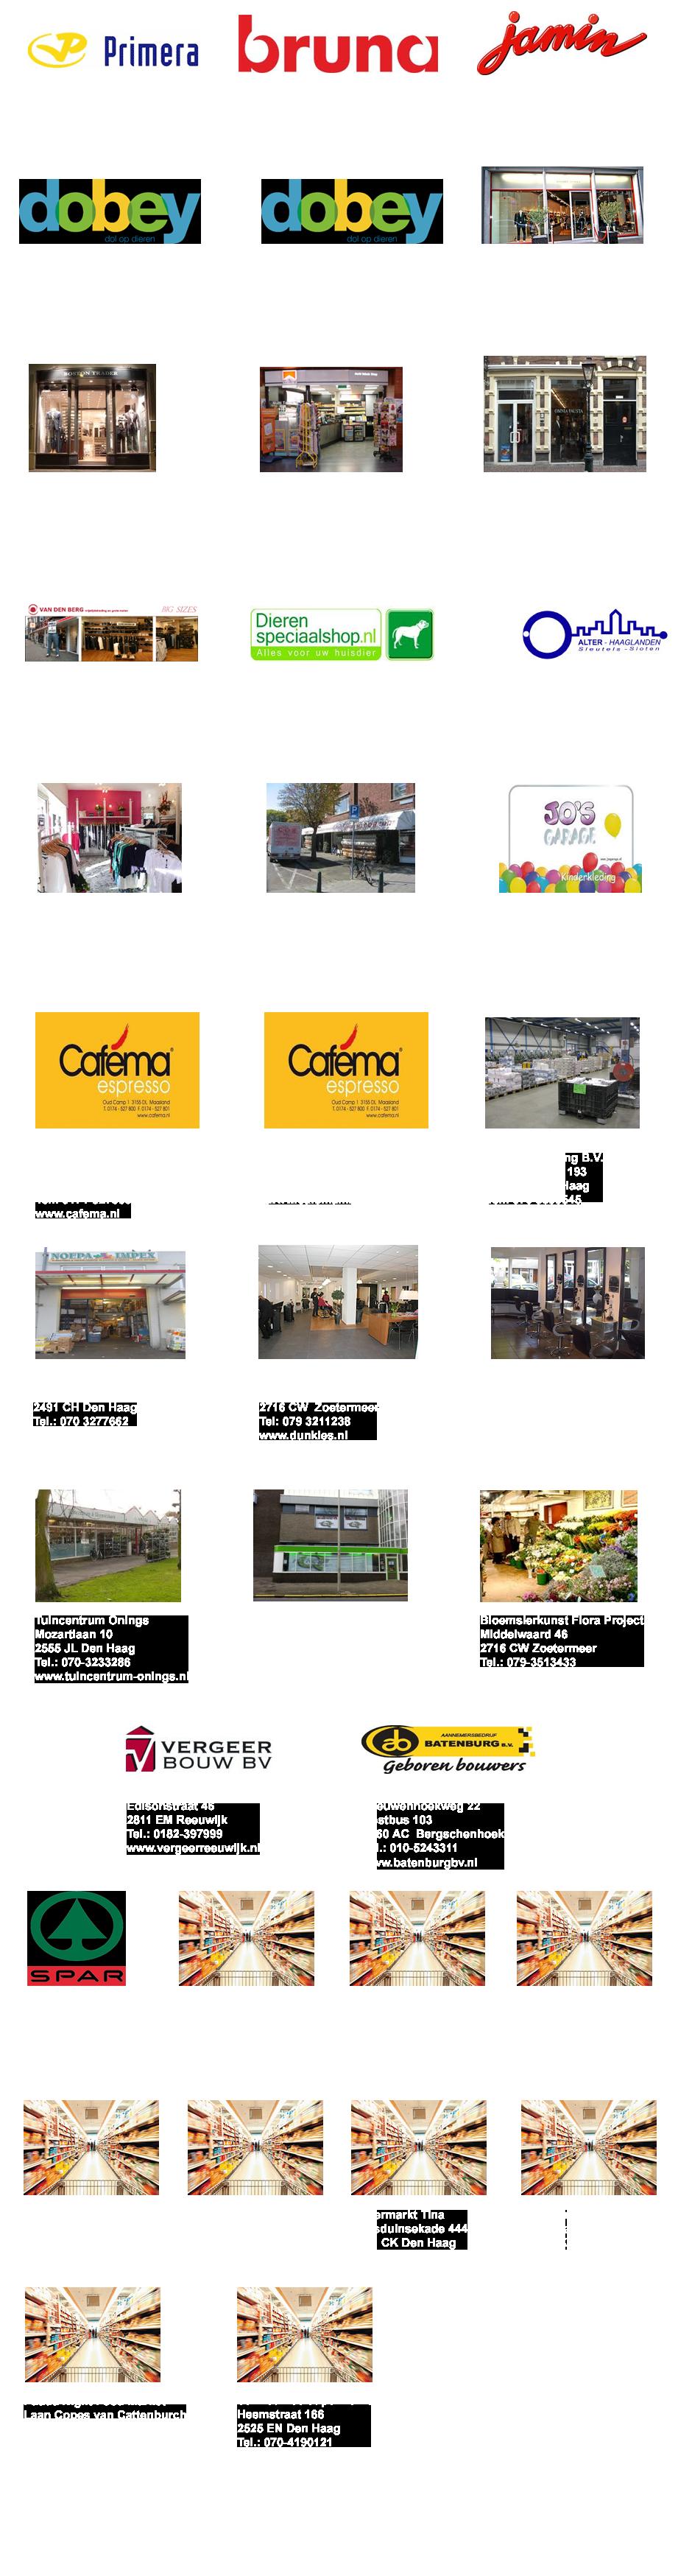 Retail / Food